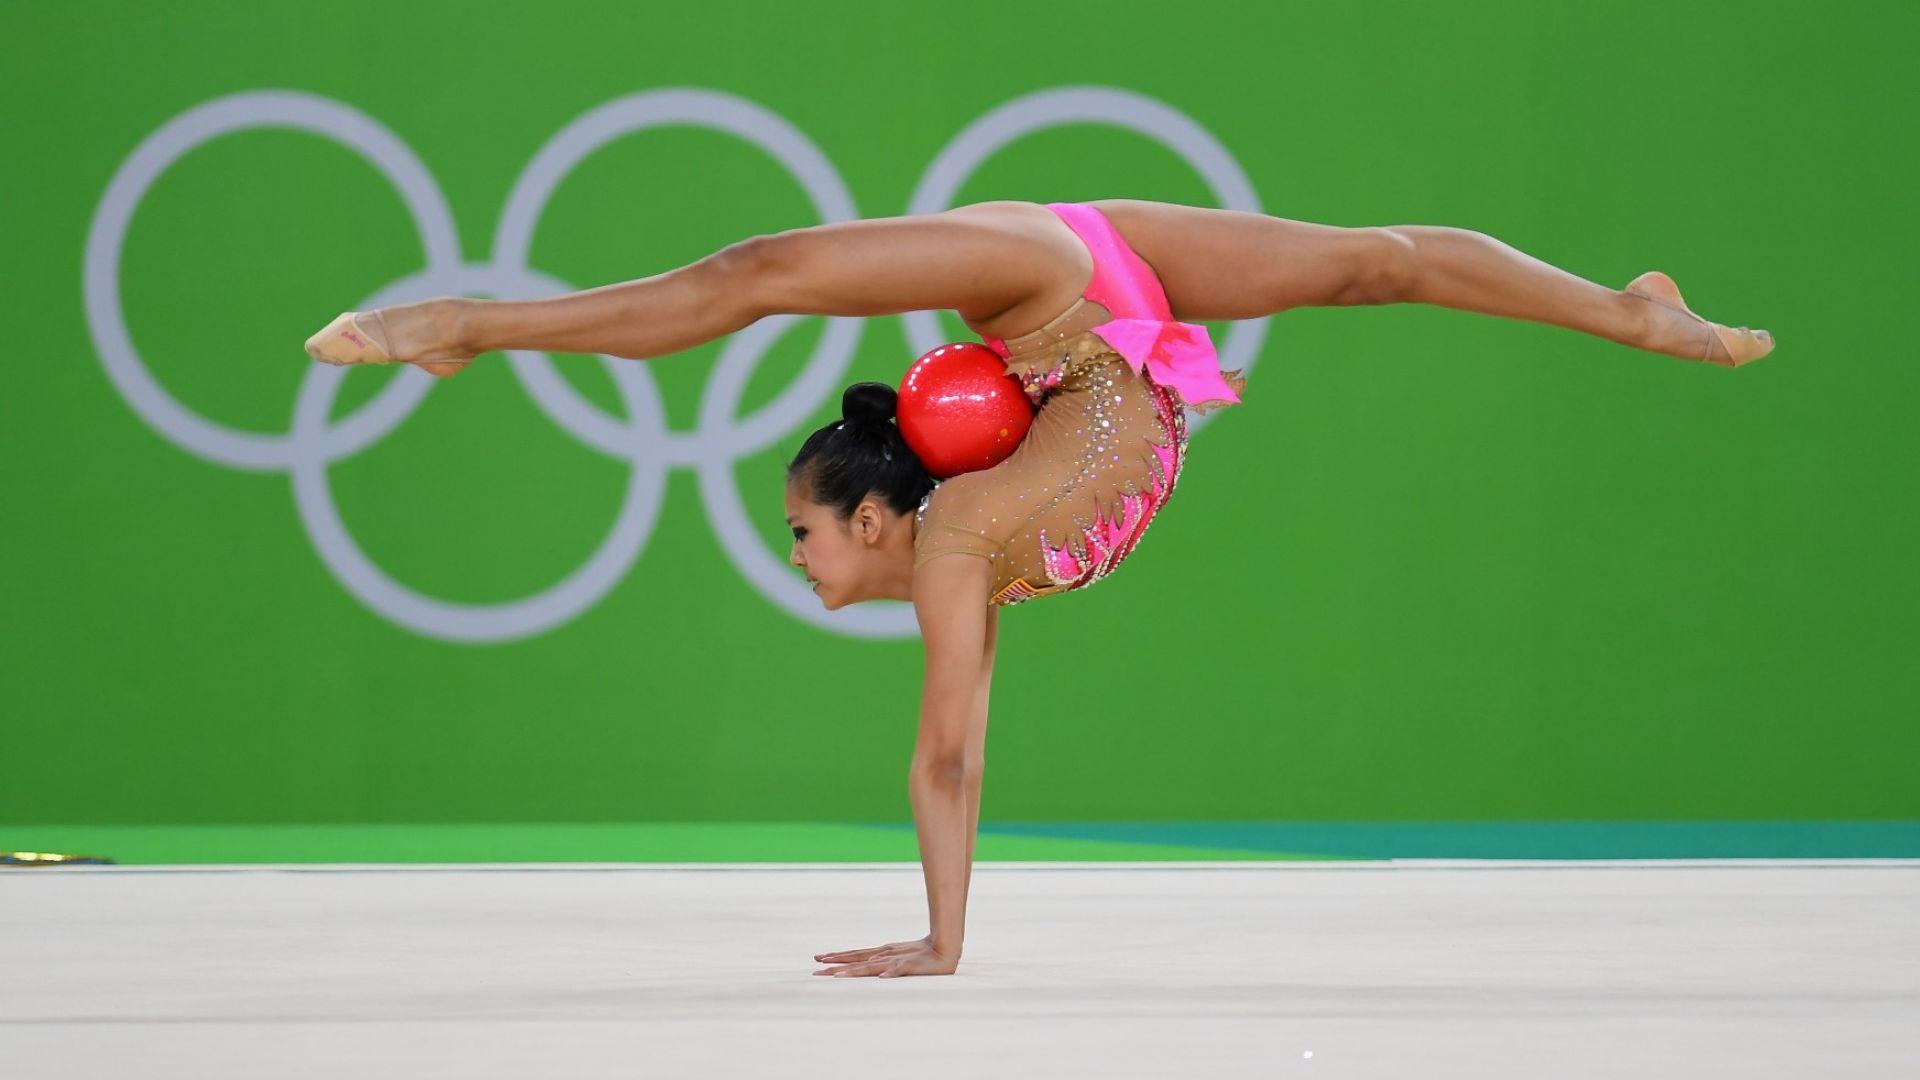 Американска гимнастичка изгоря с допинг